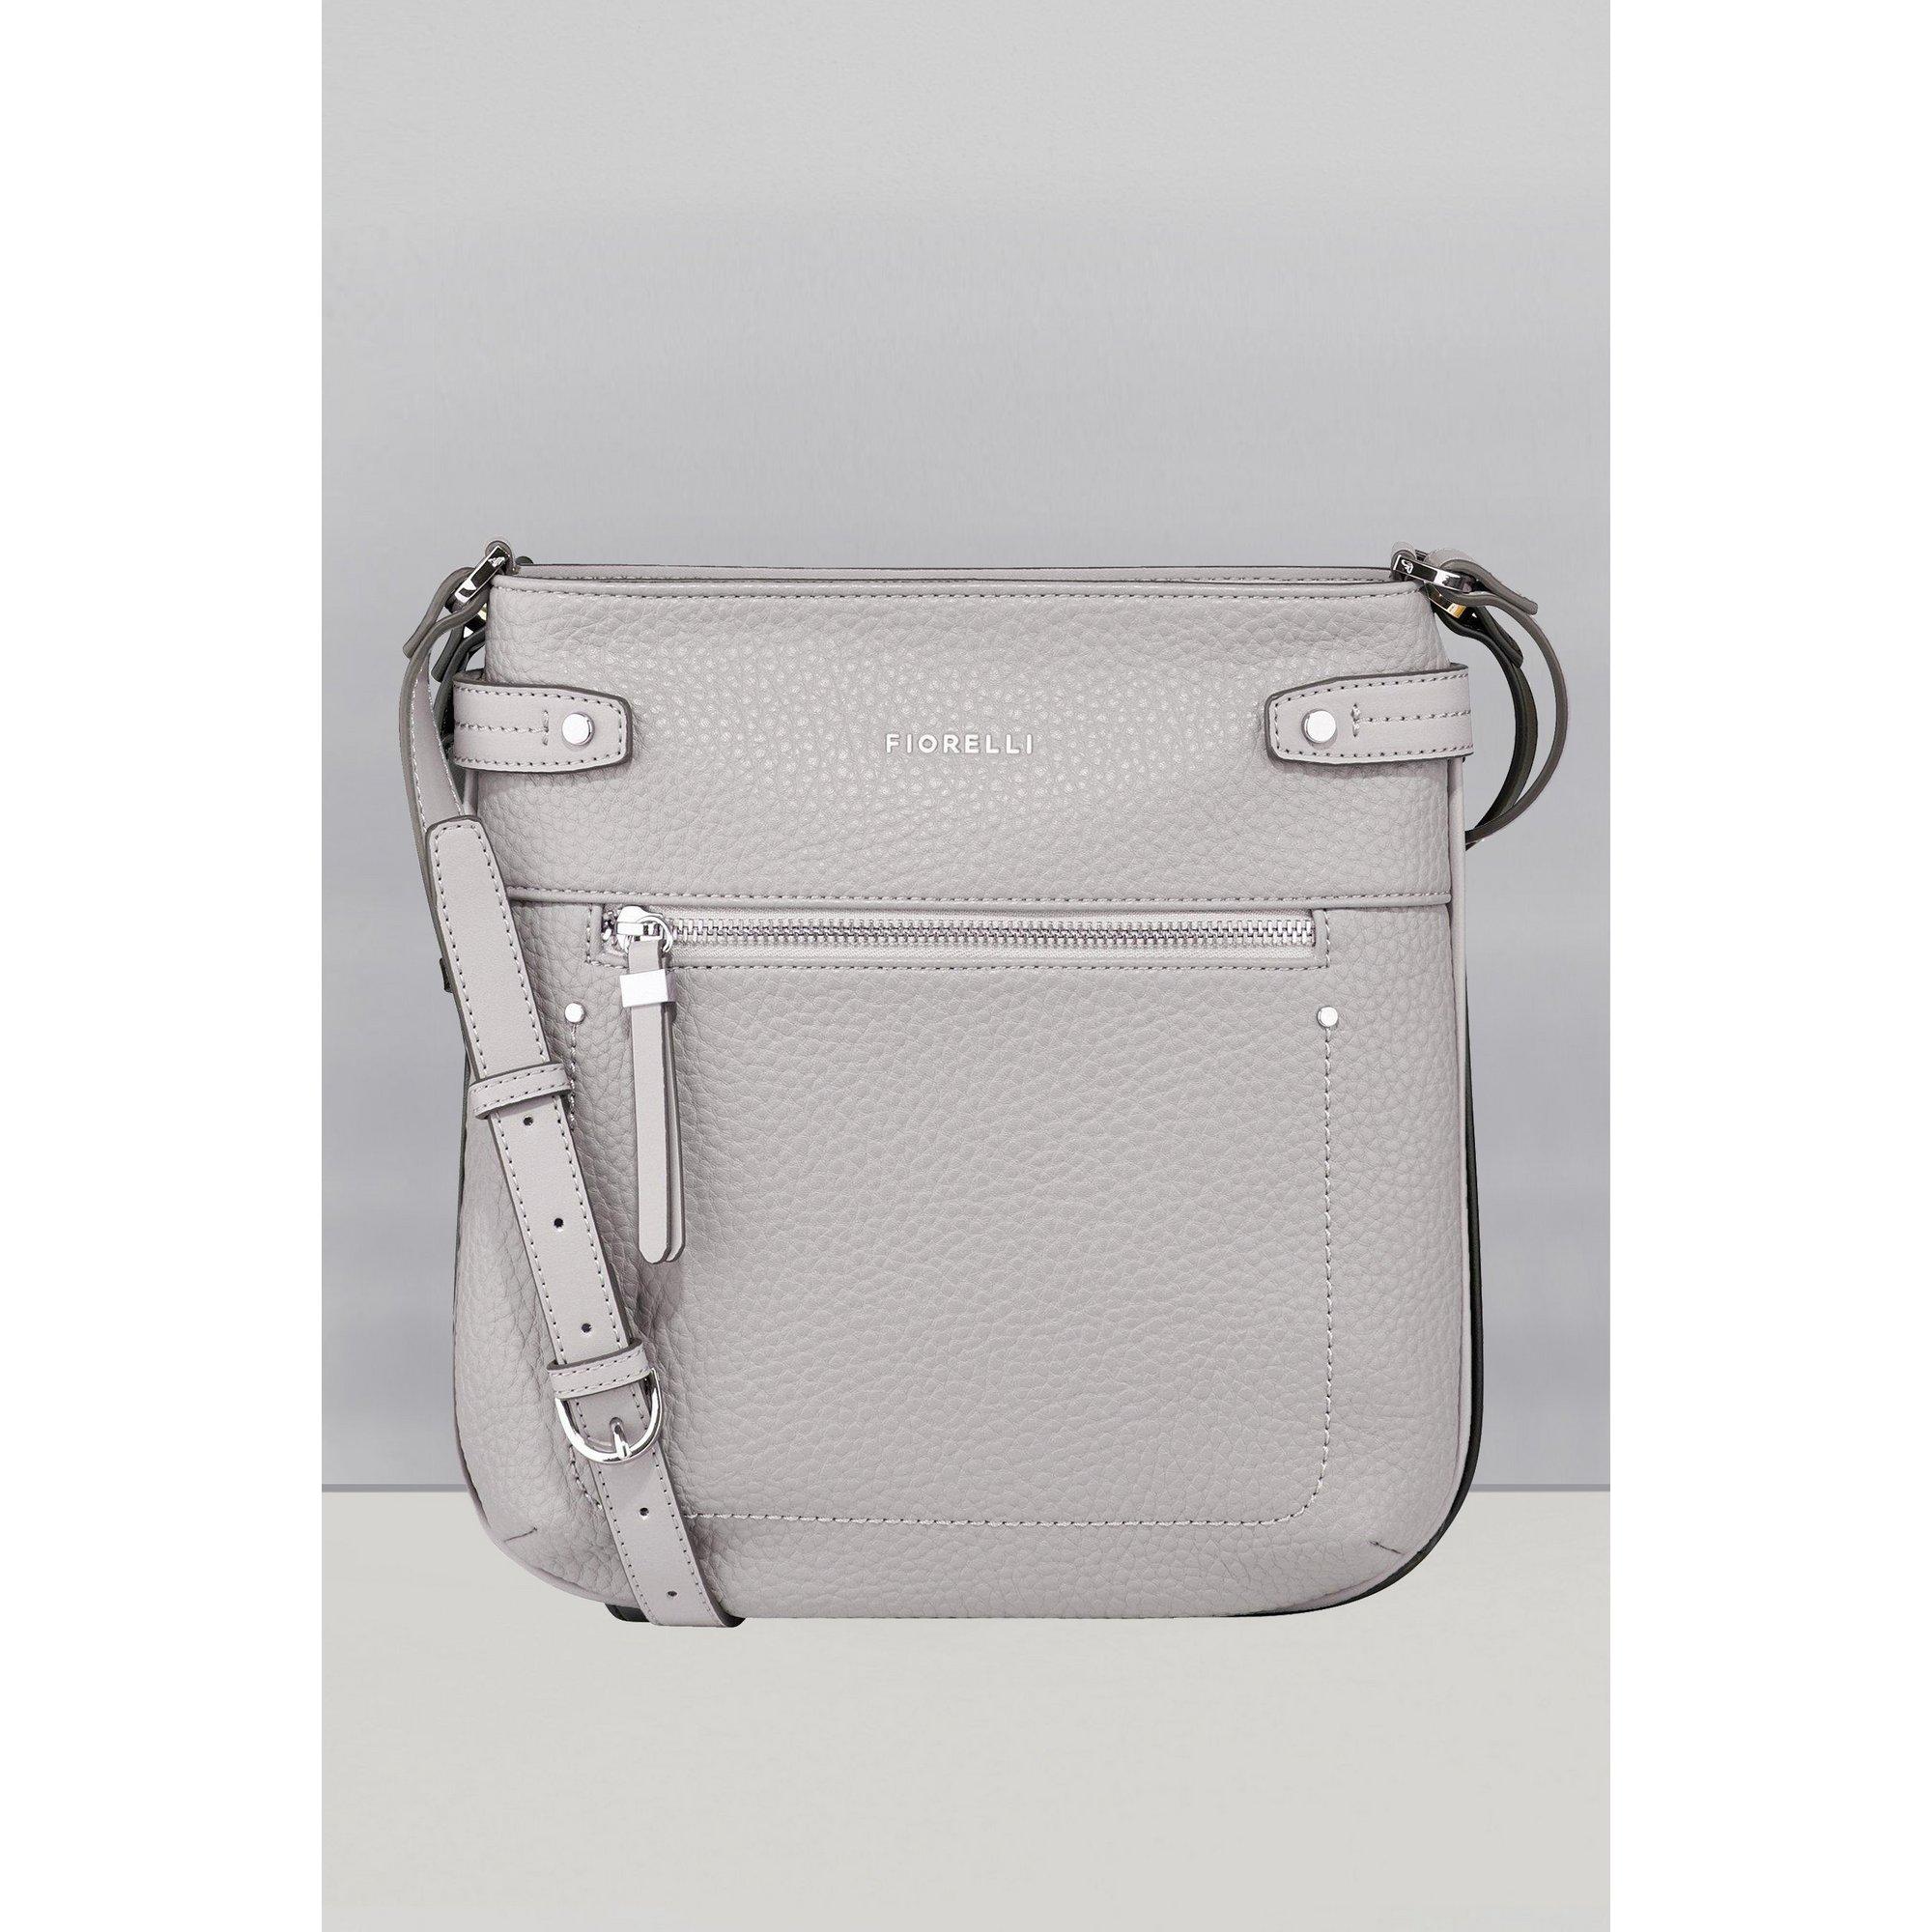 Image of Fiorelli Anna Cross Body Bag